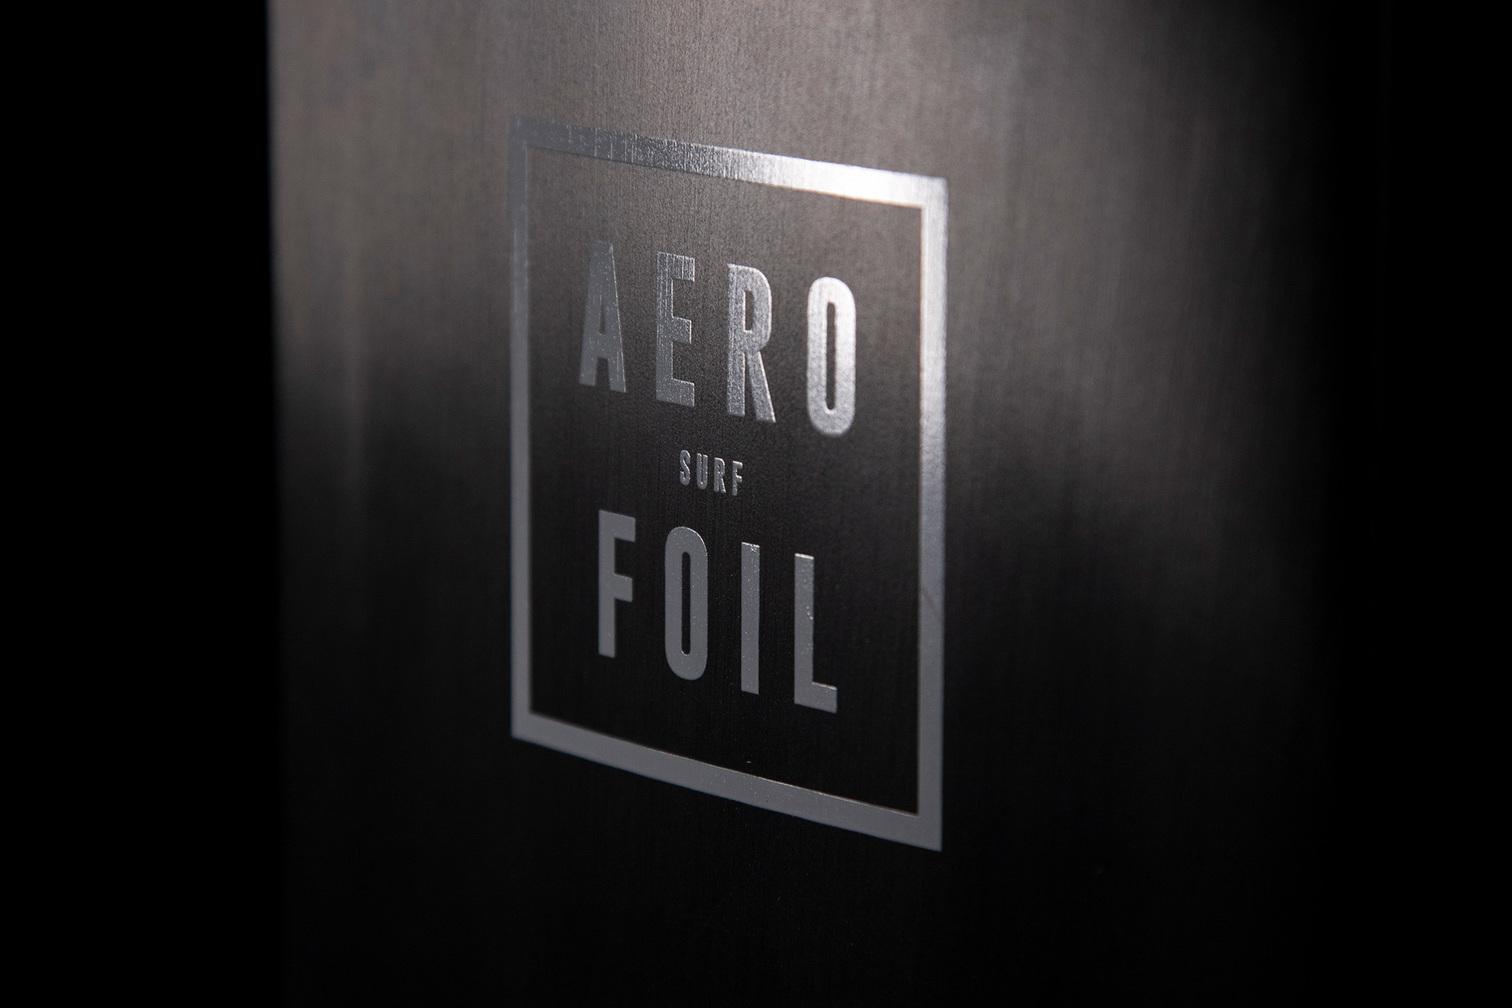 Aero Foil 2500